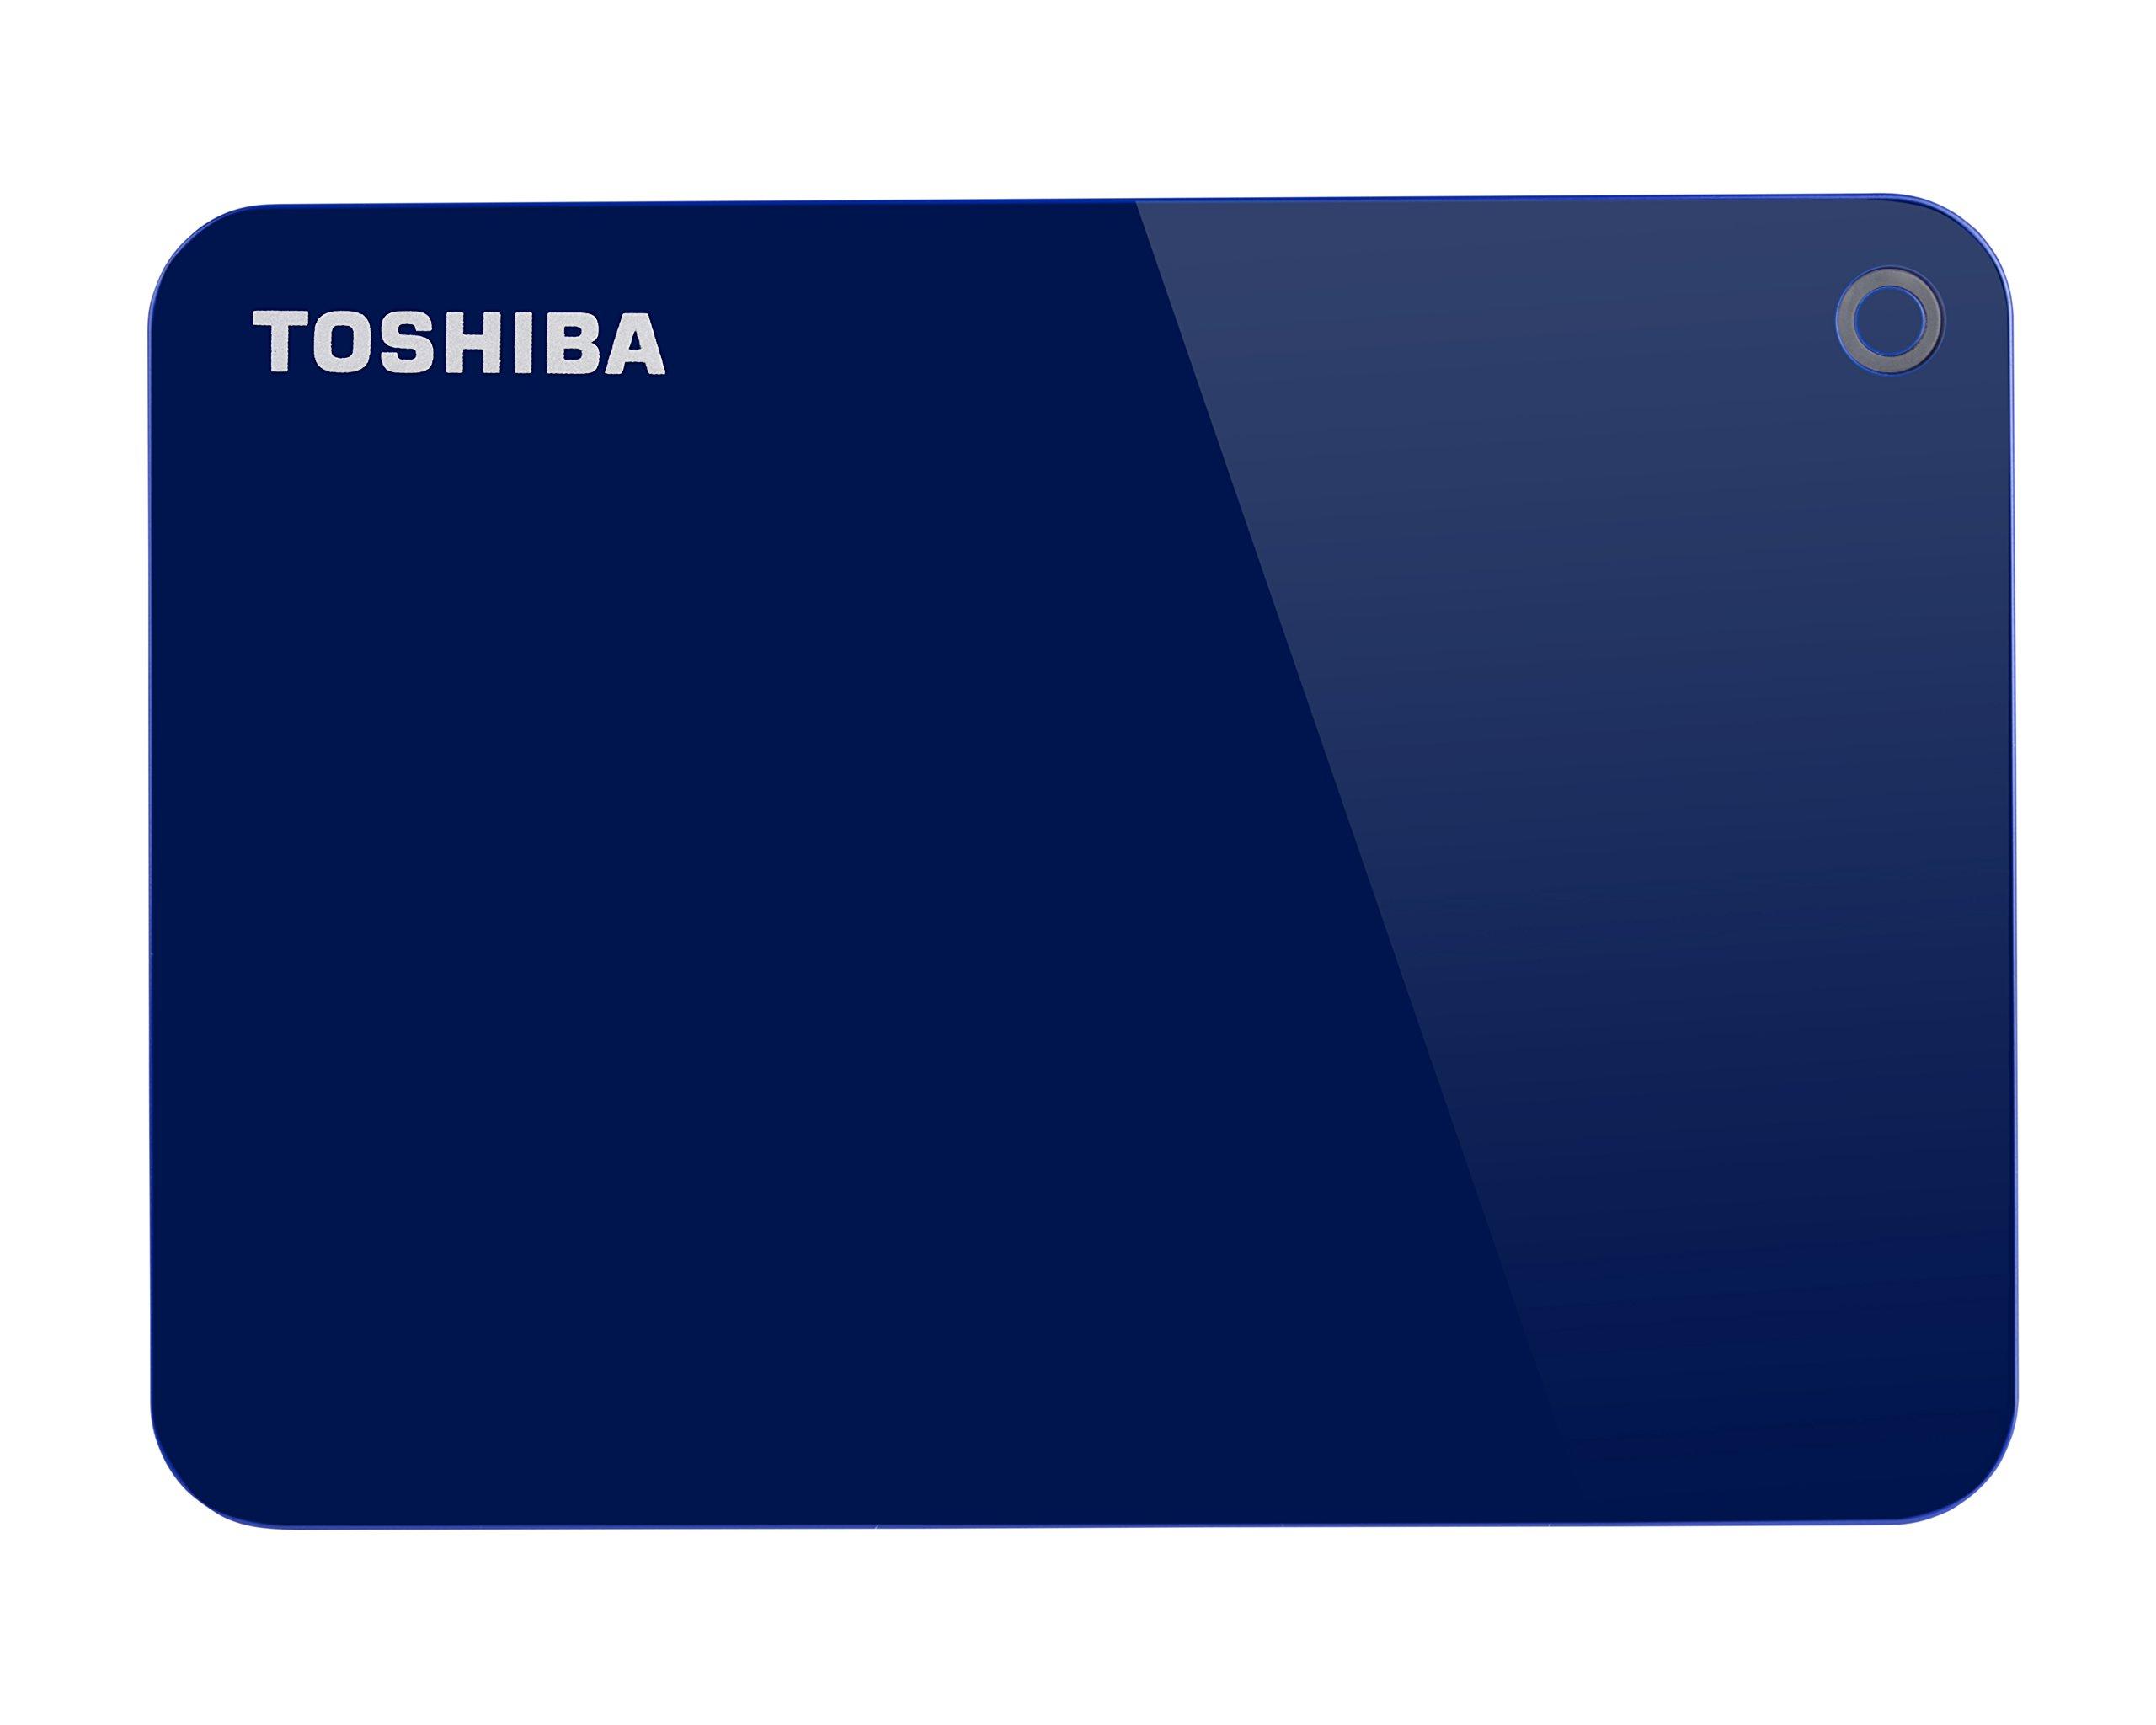 Toshiba Canvio Advance 1TB Portable External Hard Drive USB 3.0, Blue (HDTC910XL3AA) by Toshiba (Image #2)